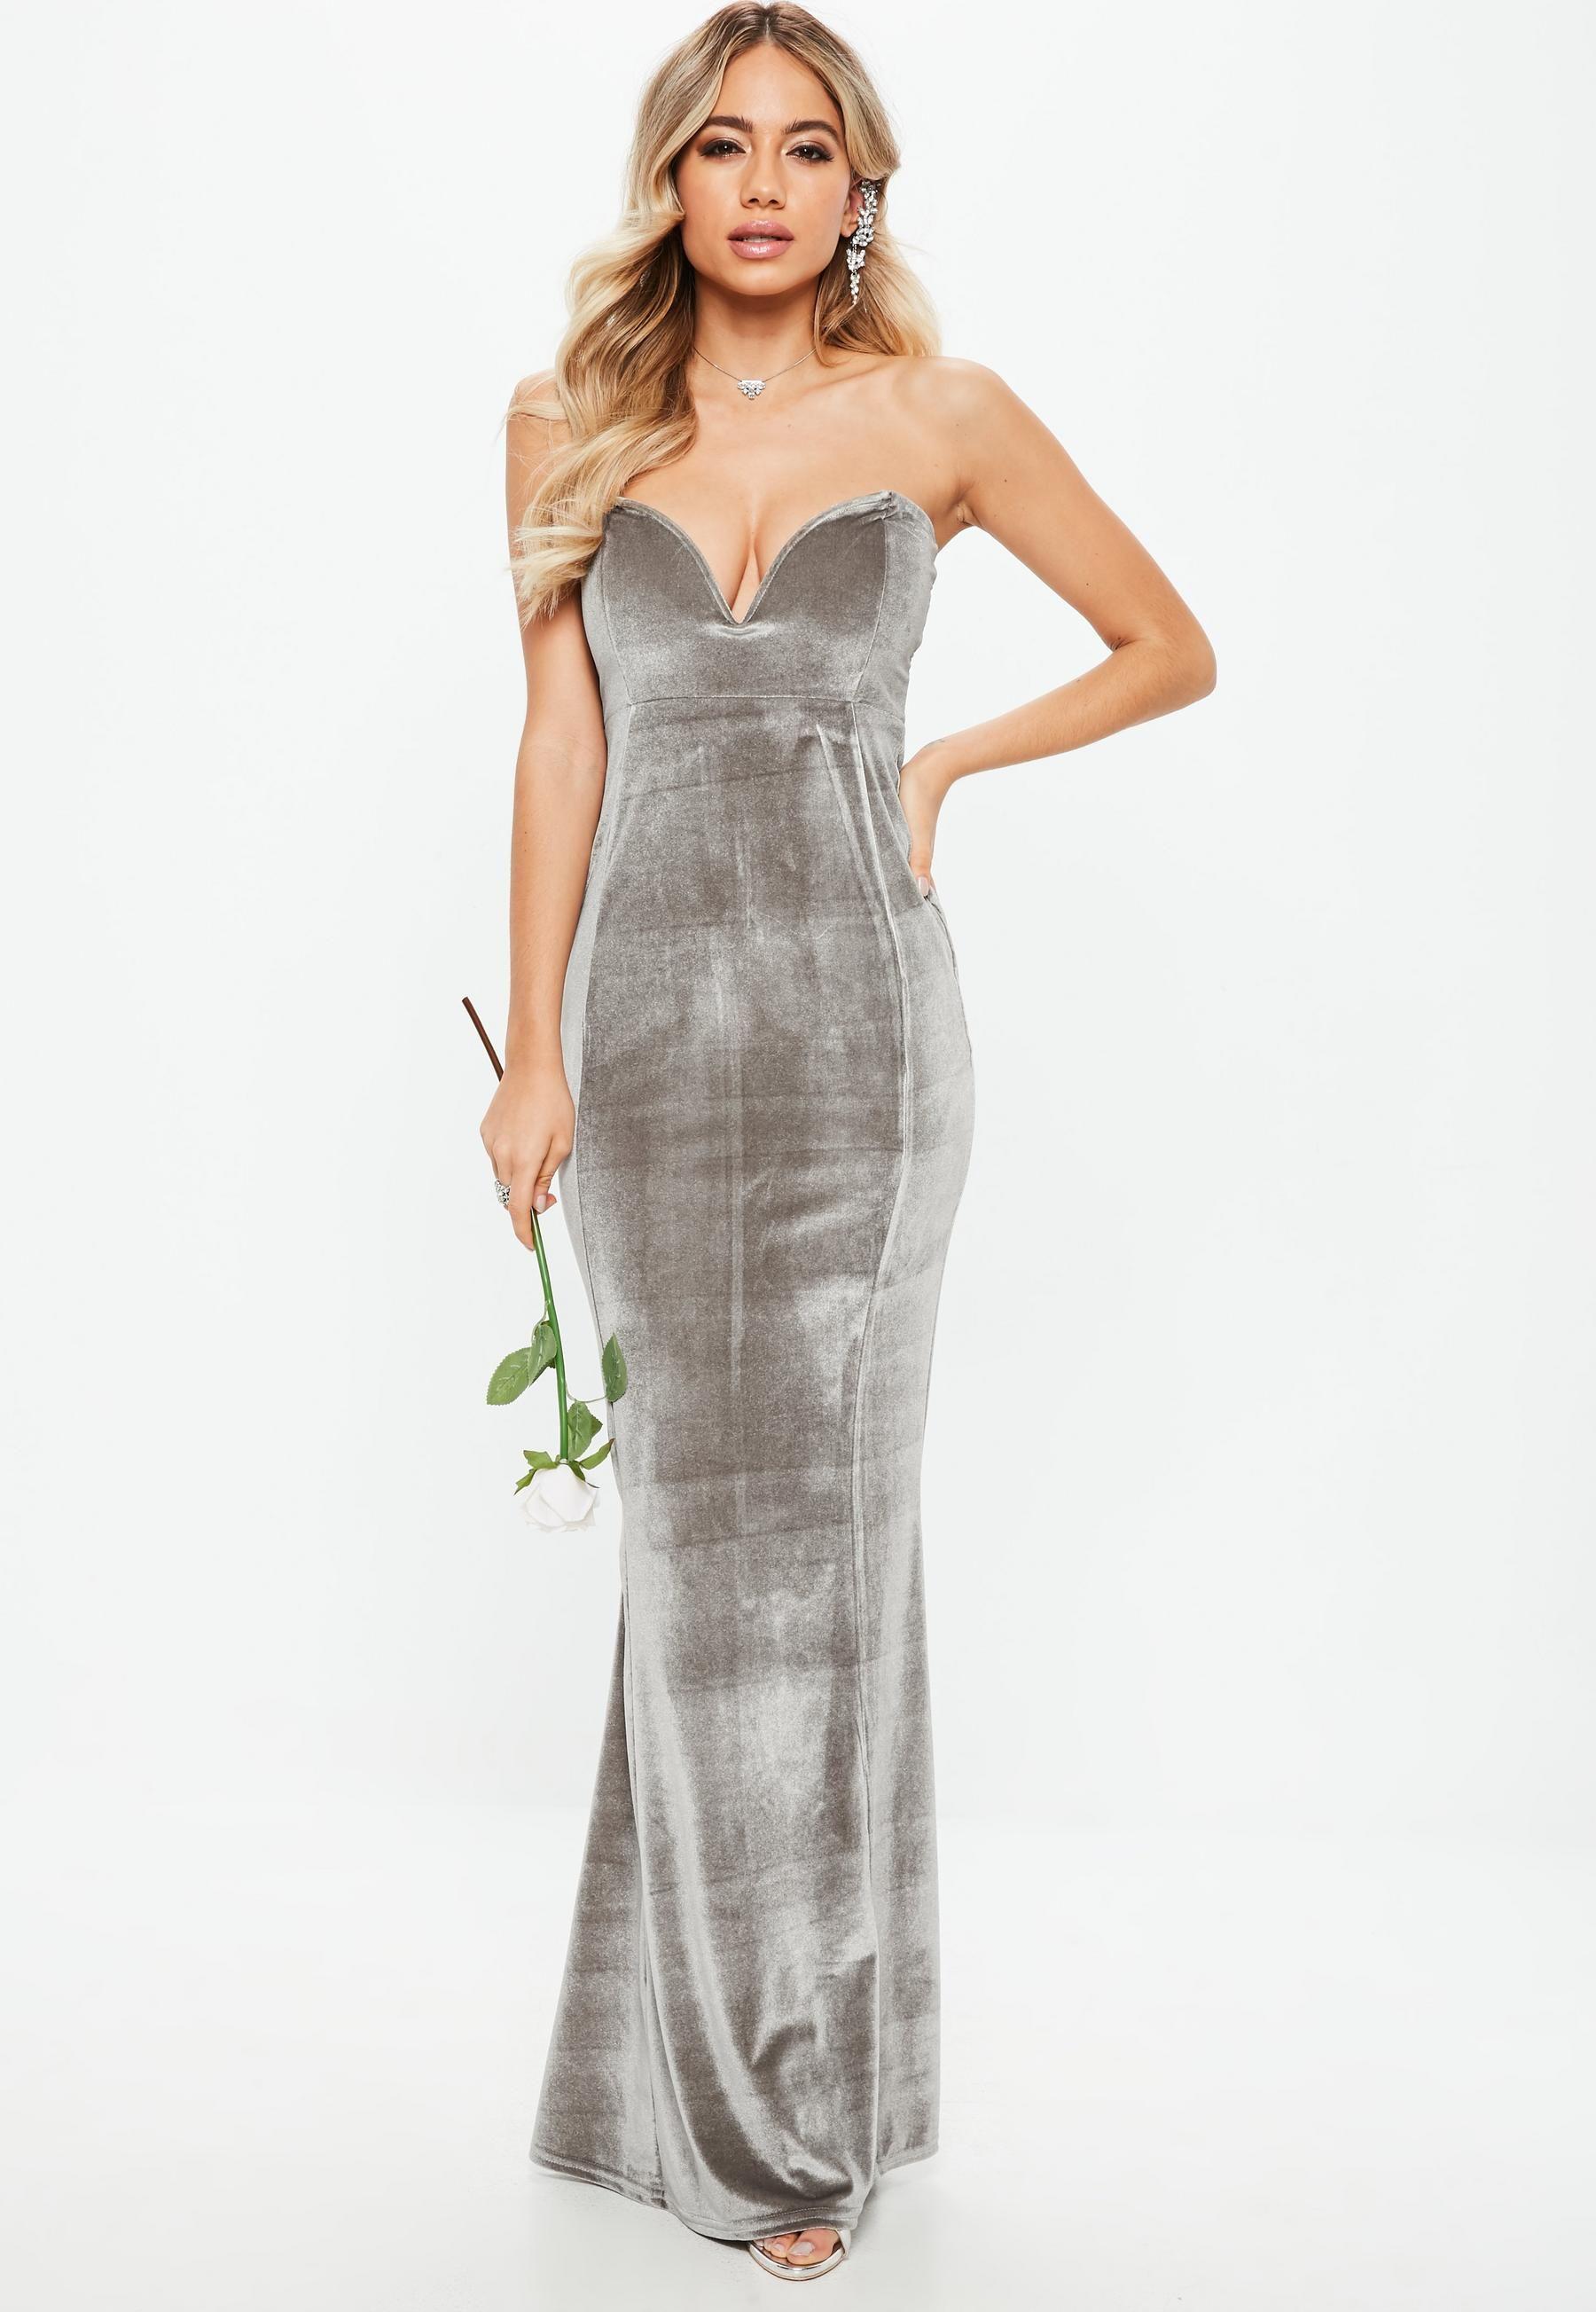 Bridesmaid Gray Velvet Sweatheart Maxi Dress | Missguided |Beautiful ...